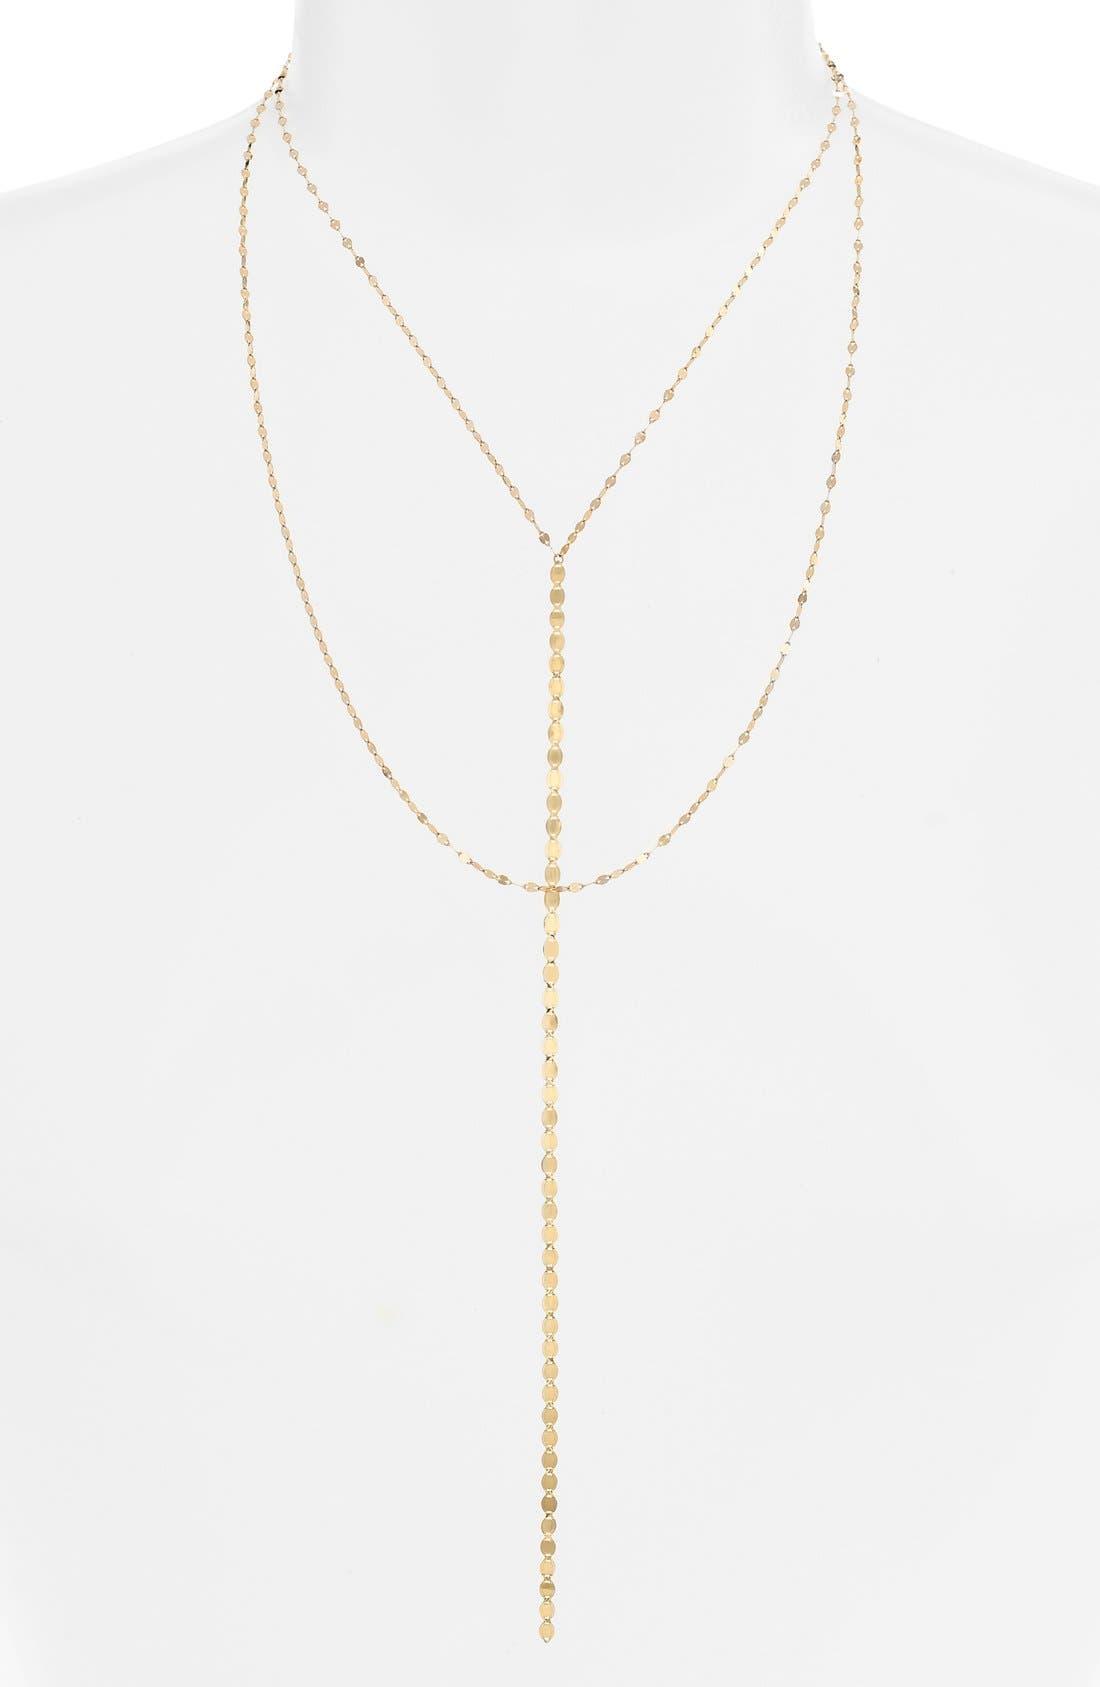 Alternate Image 1 Selected - Lana Jewelry 'Nude Blake' Multistrand Drop Necklace